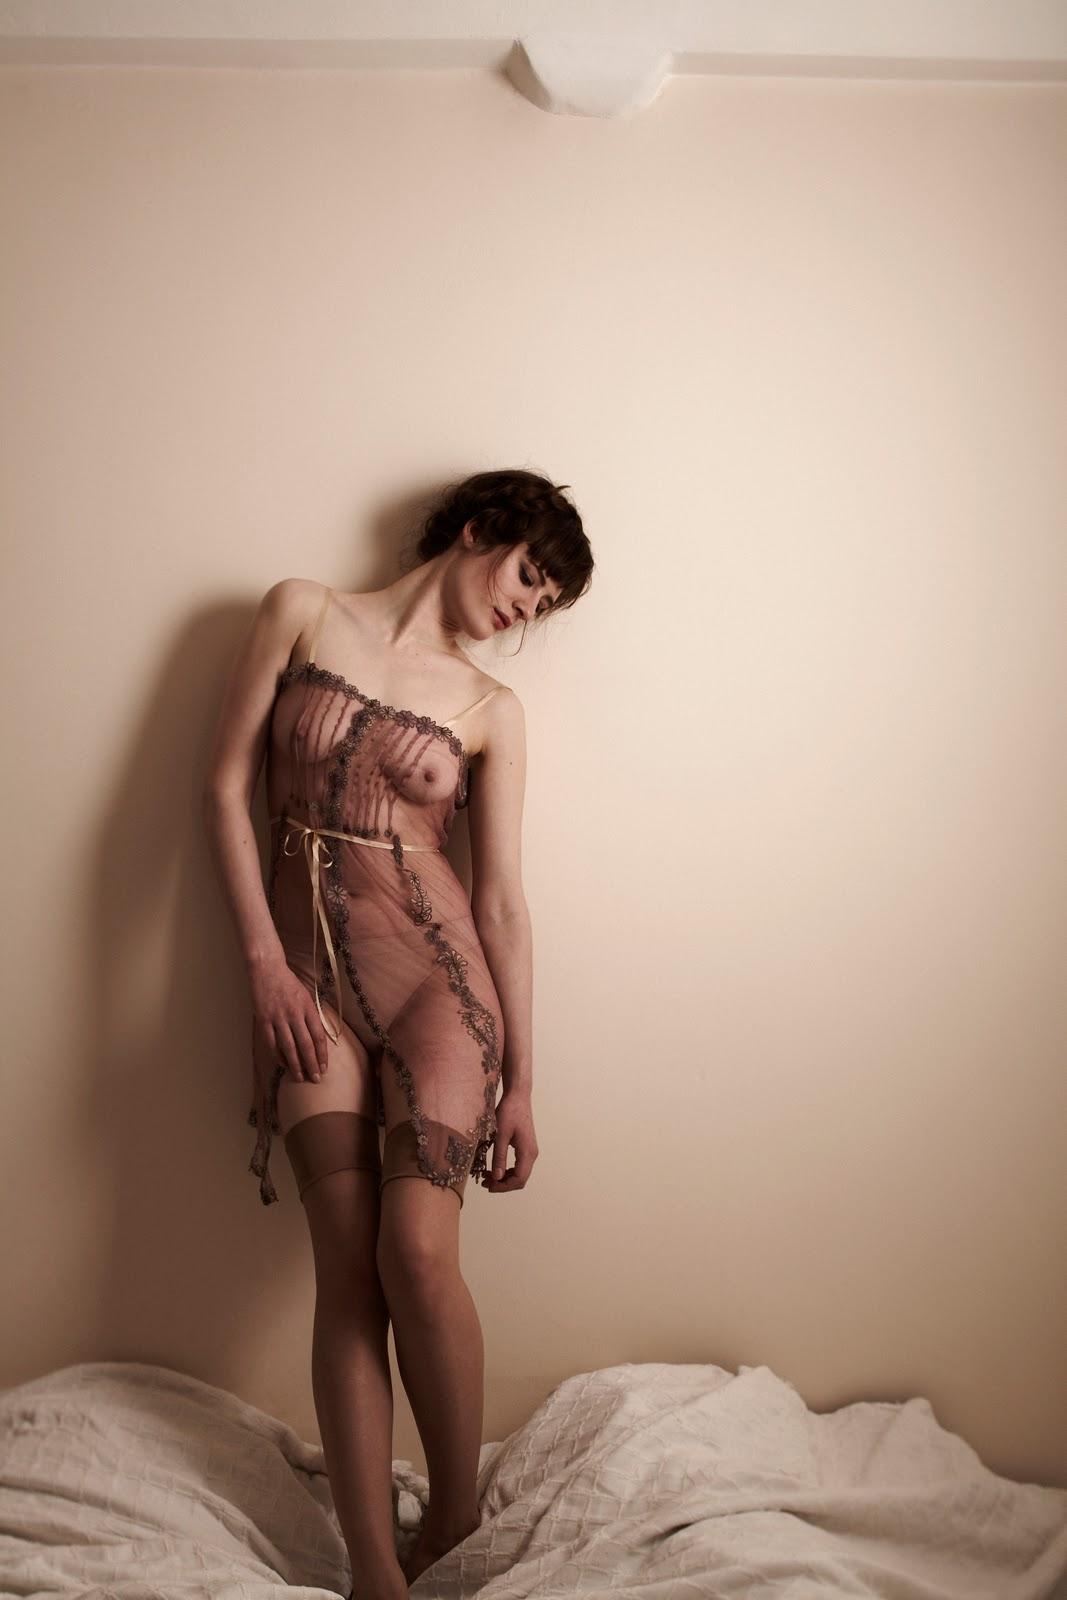 Яндекс эротика женщины фото 22 фотография